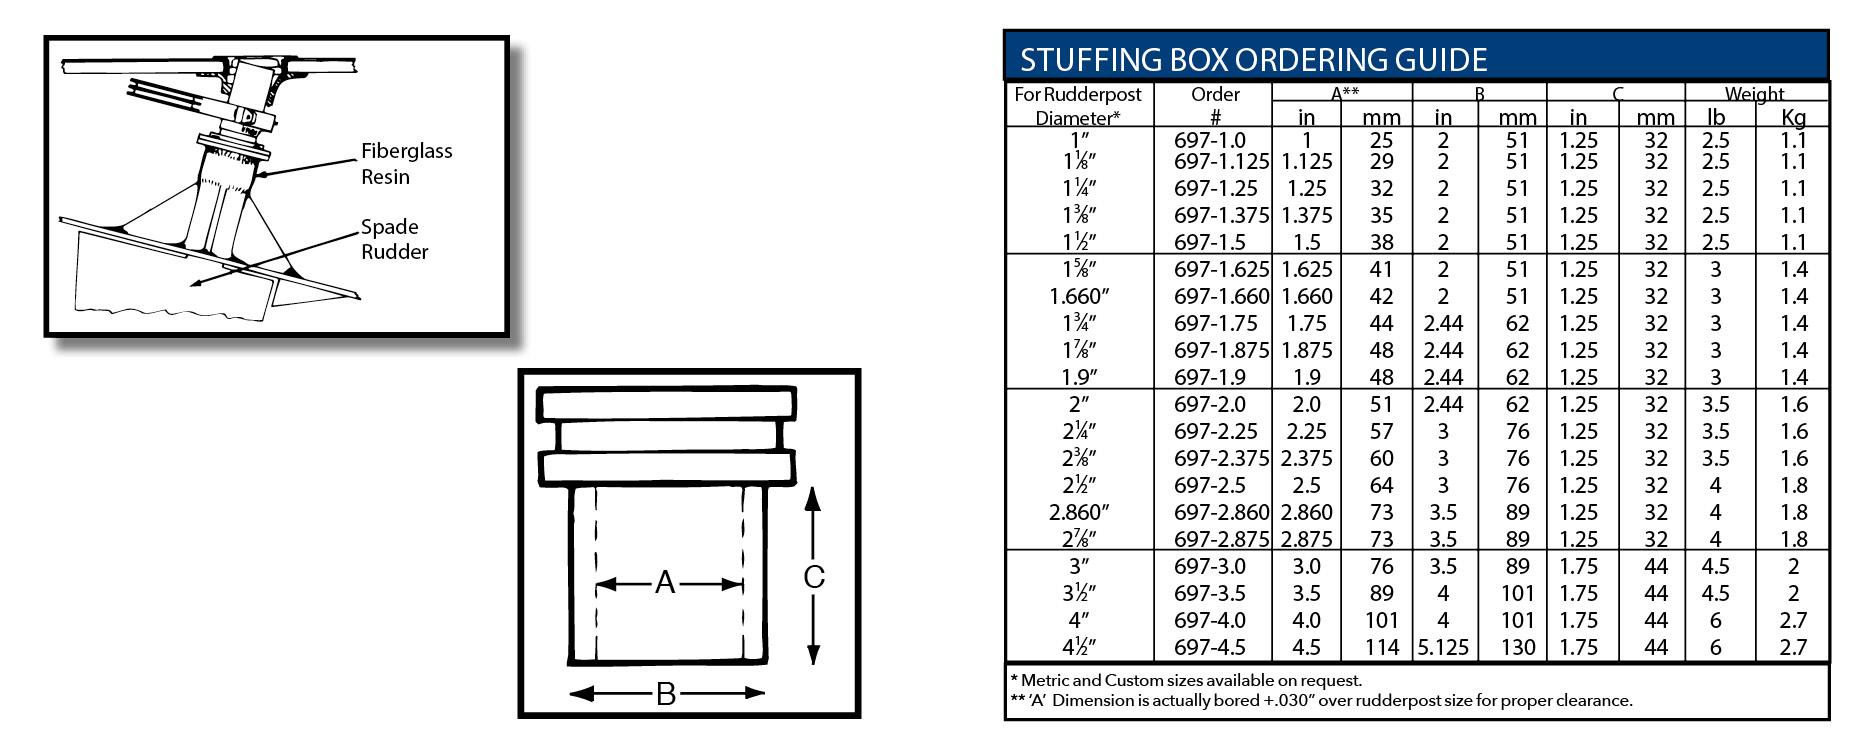 Rudder Post Stuffing Box/Bearing Ordering Guide